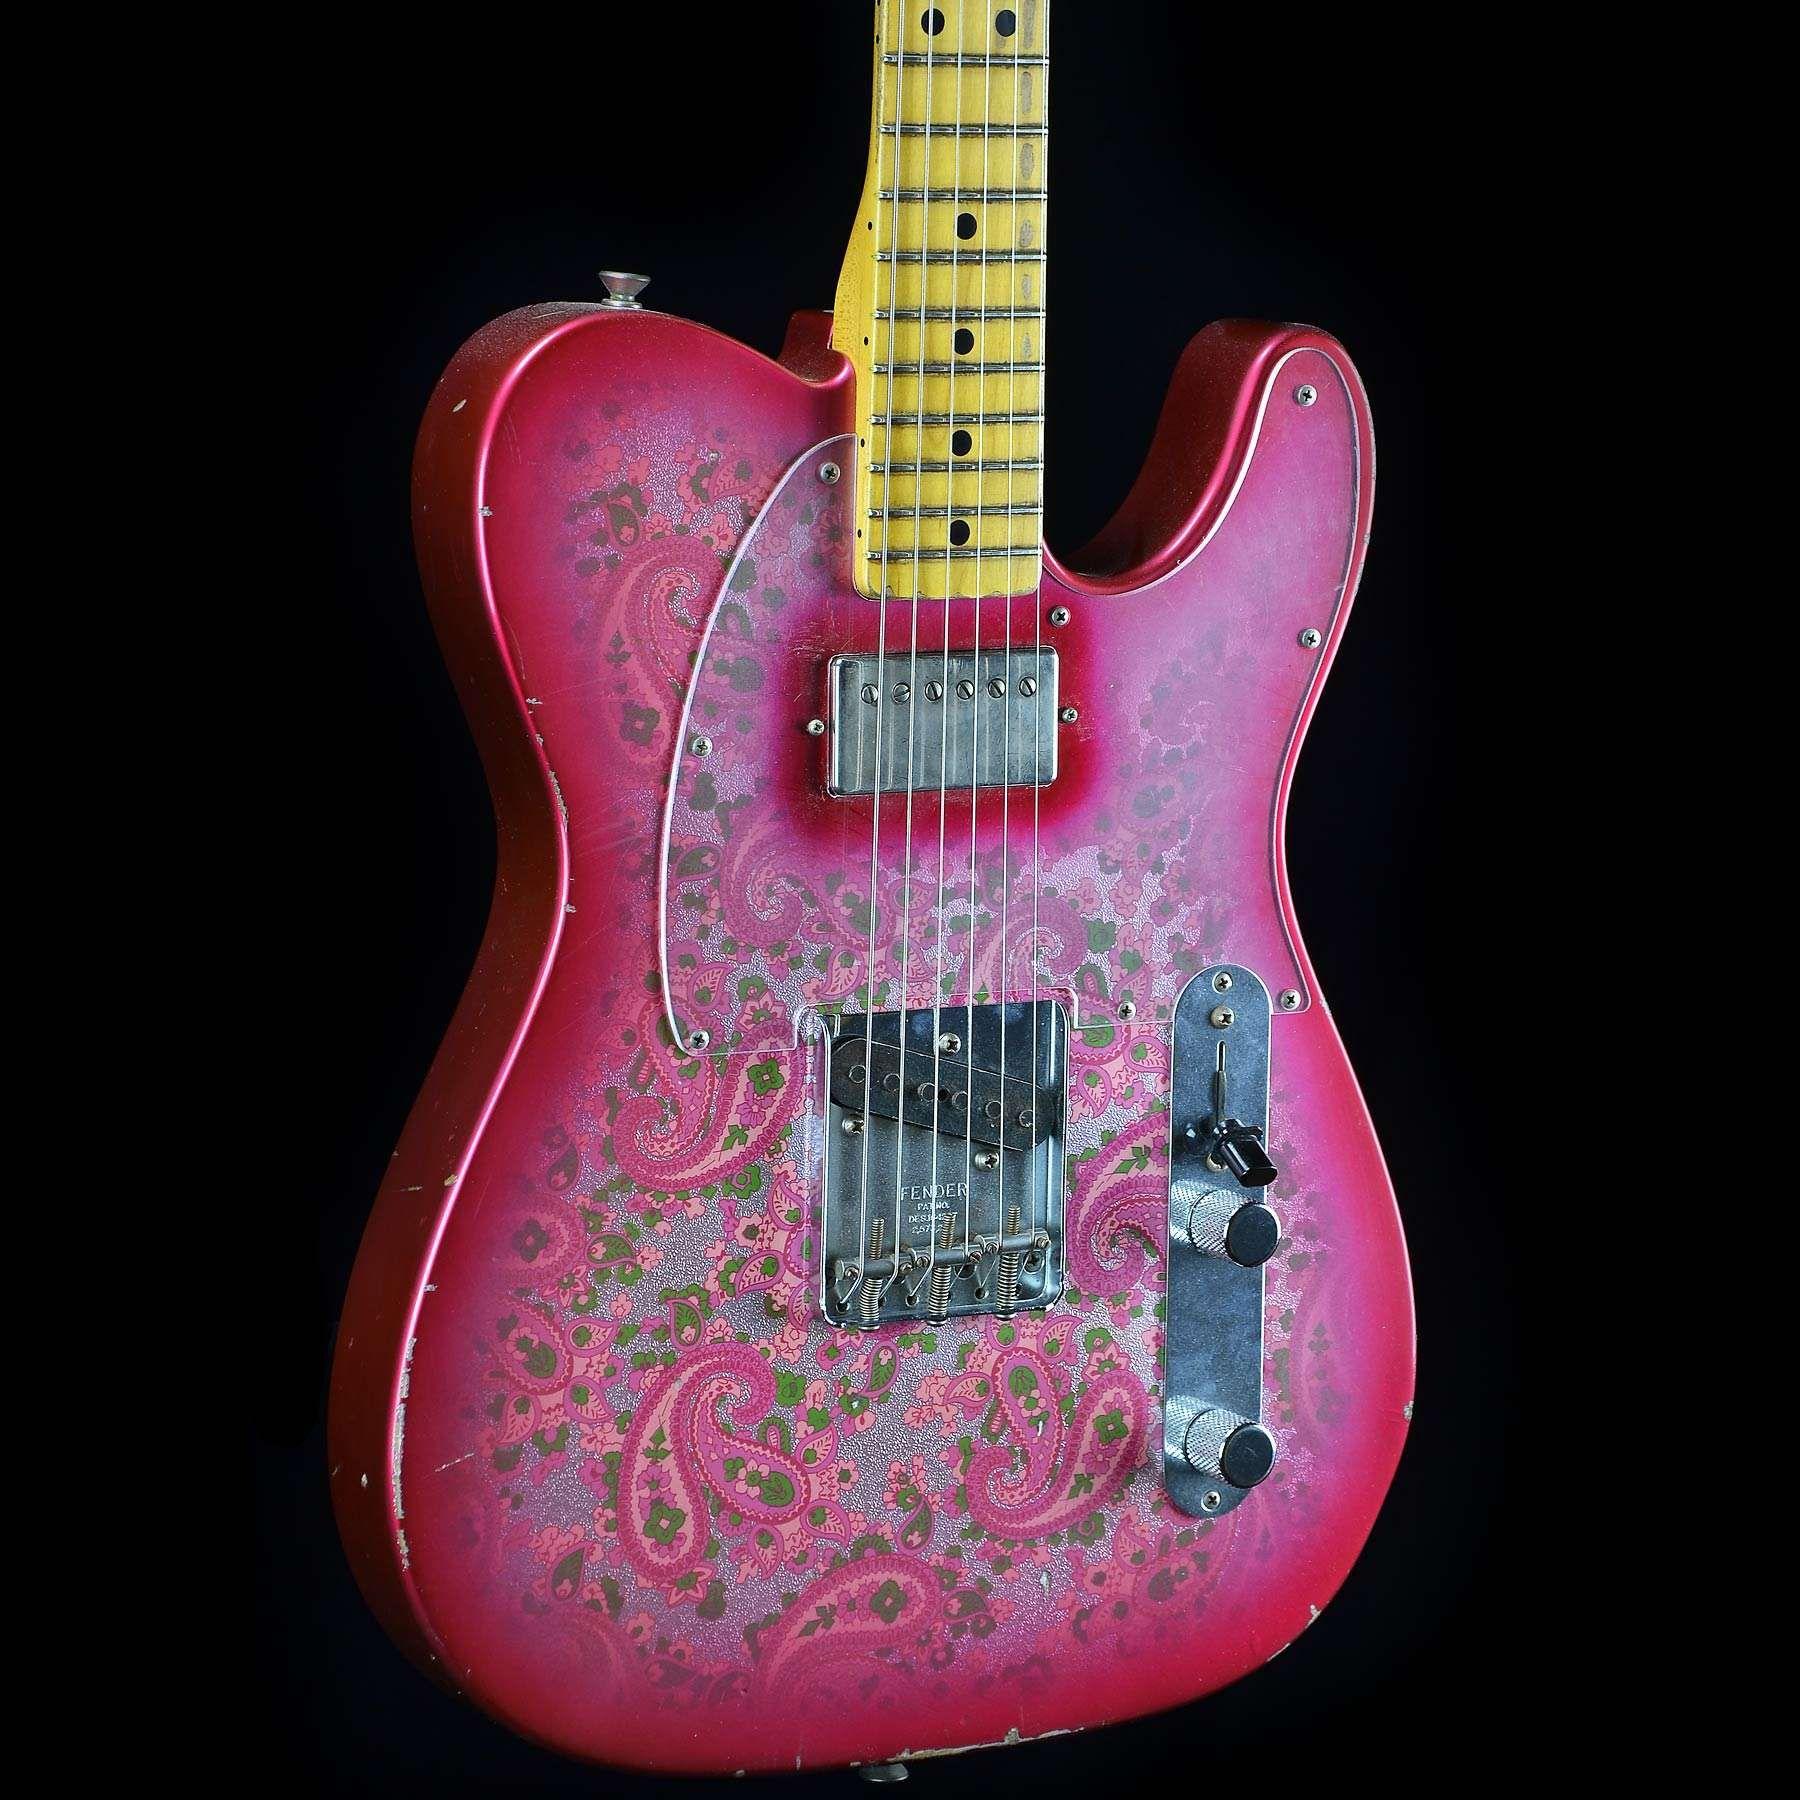 Fender Masterbuilt Jason Smith 1968 Pink Paisley Telecaster Tele Les Paul Black Beauty Wiring Mylespaulcom Gibson Guitars